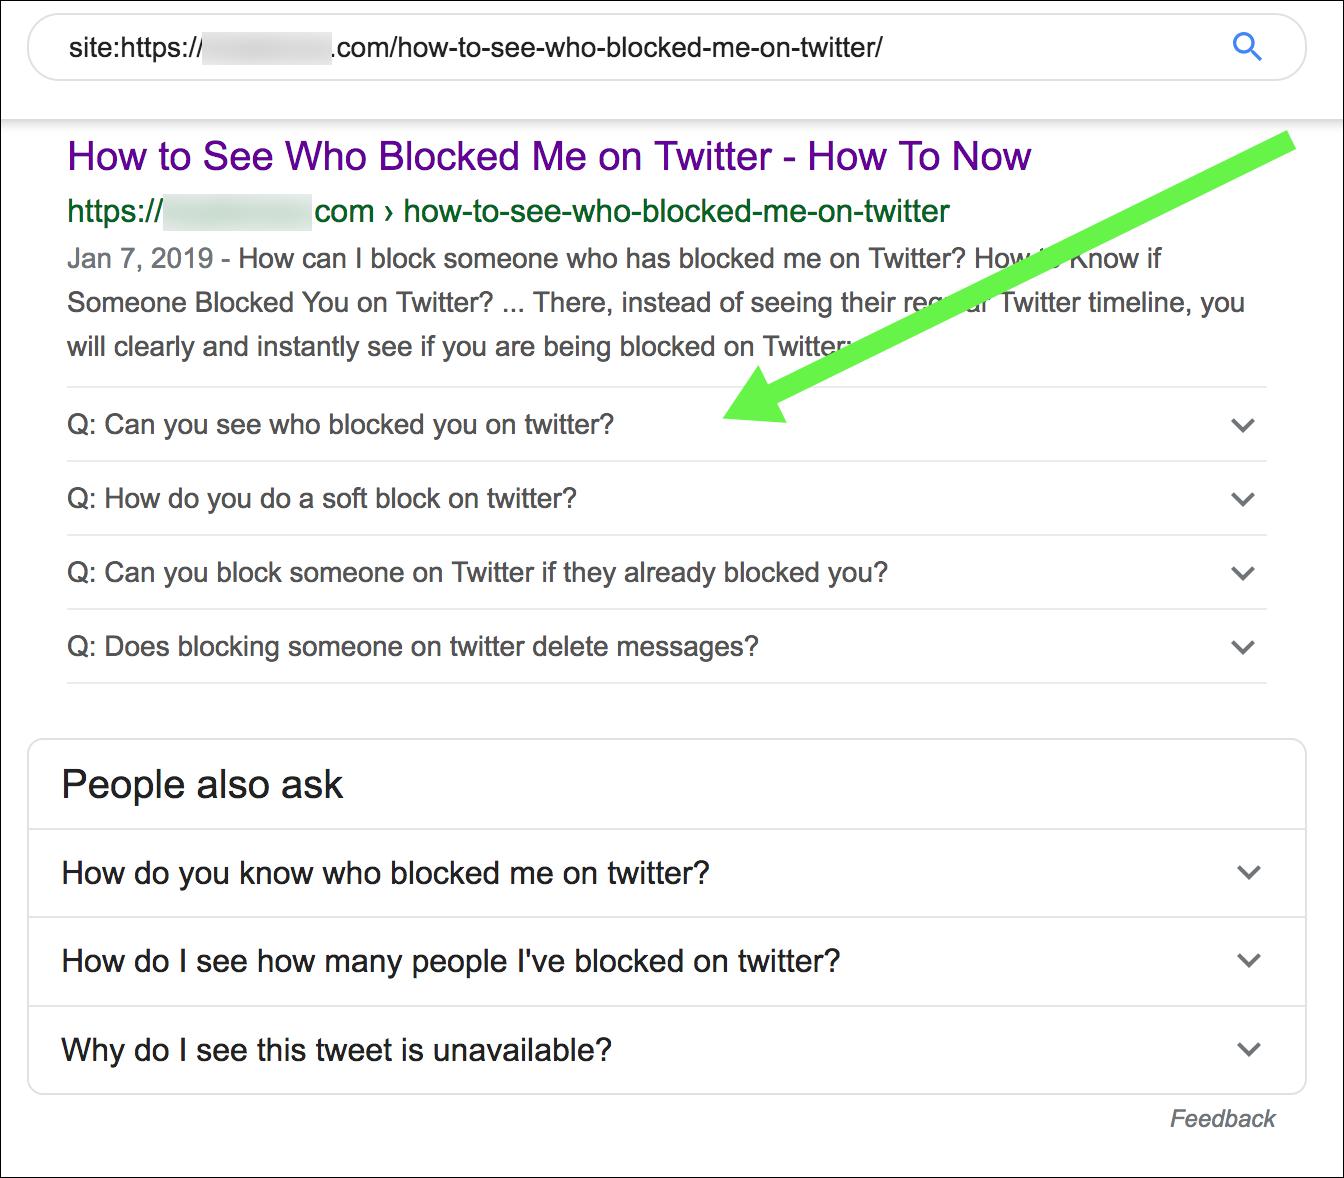 Example of Google FAQ rich result.